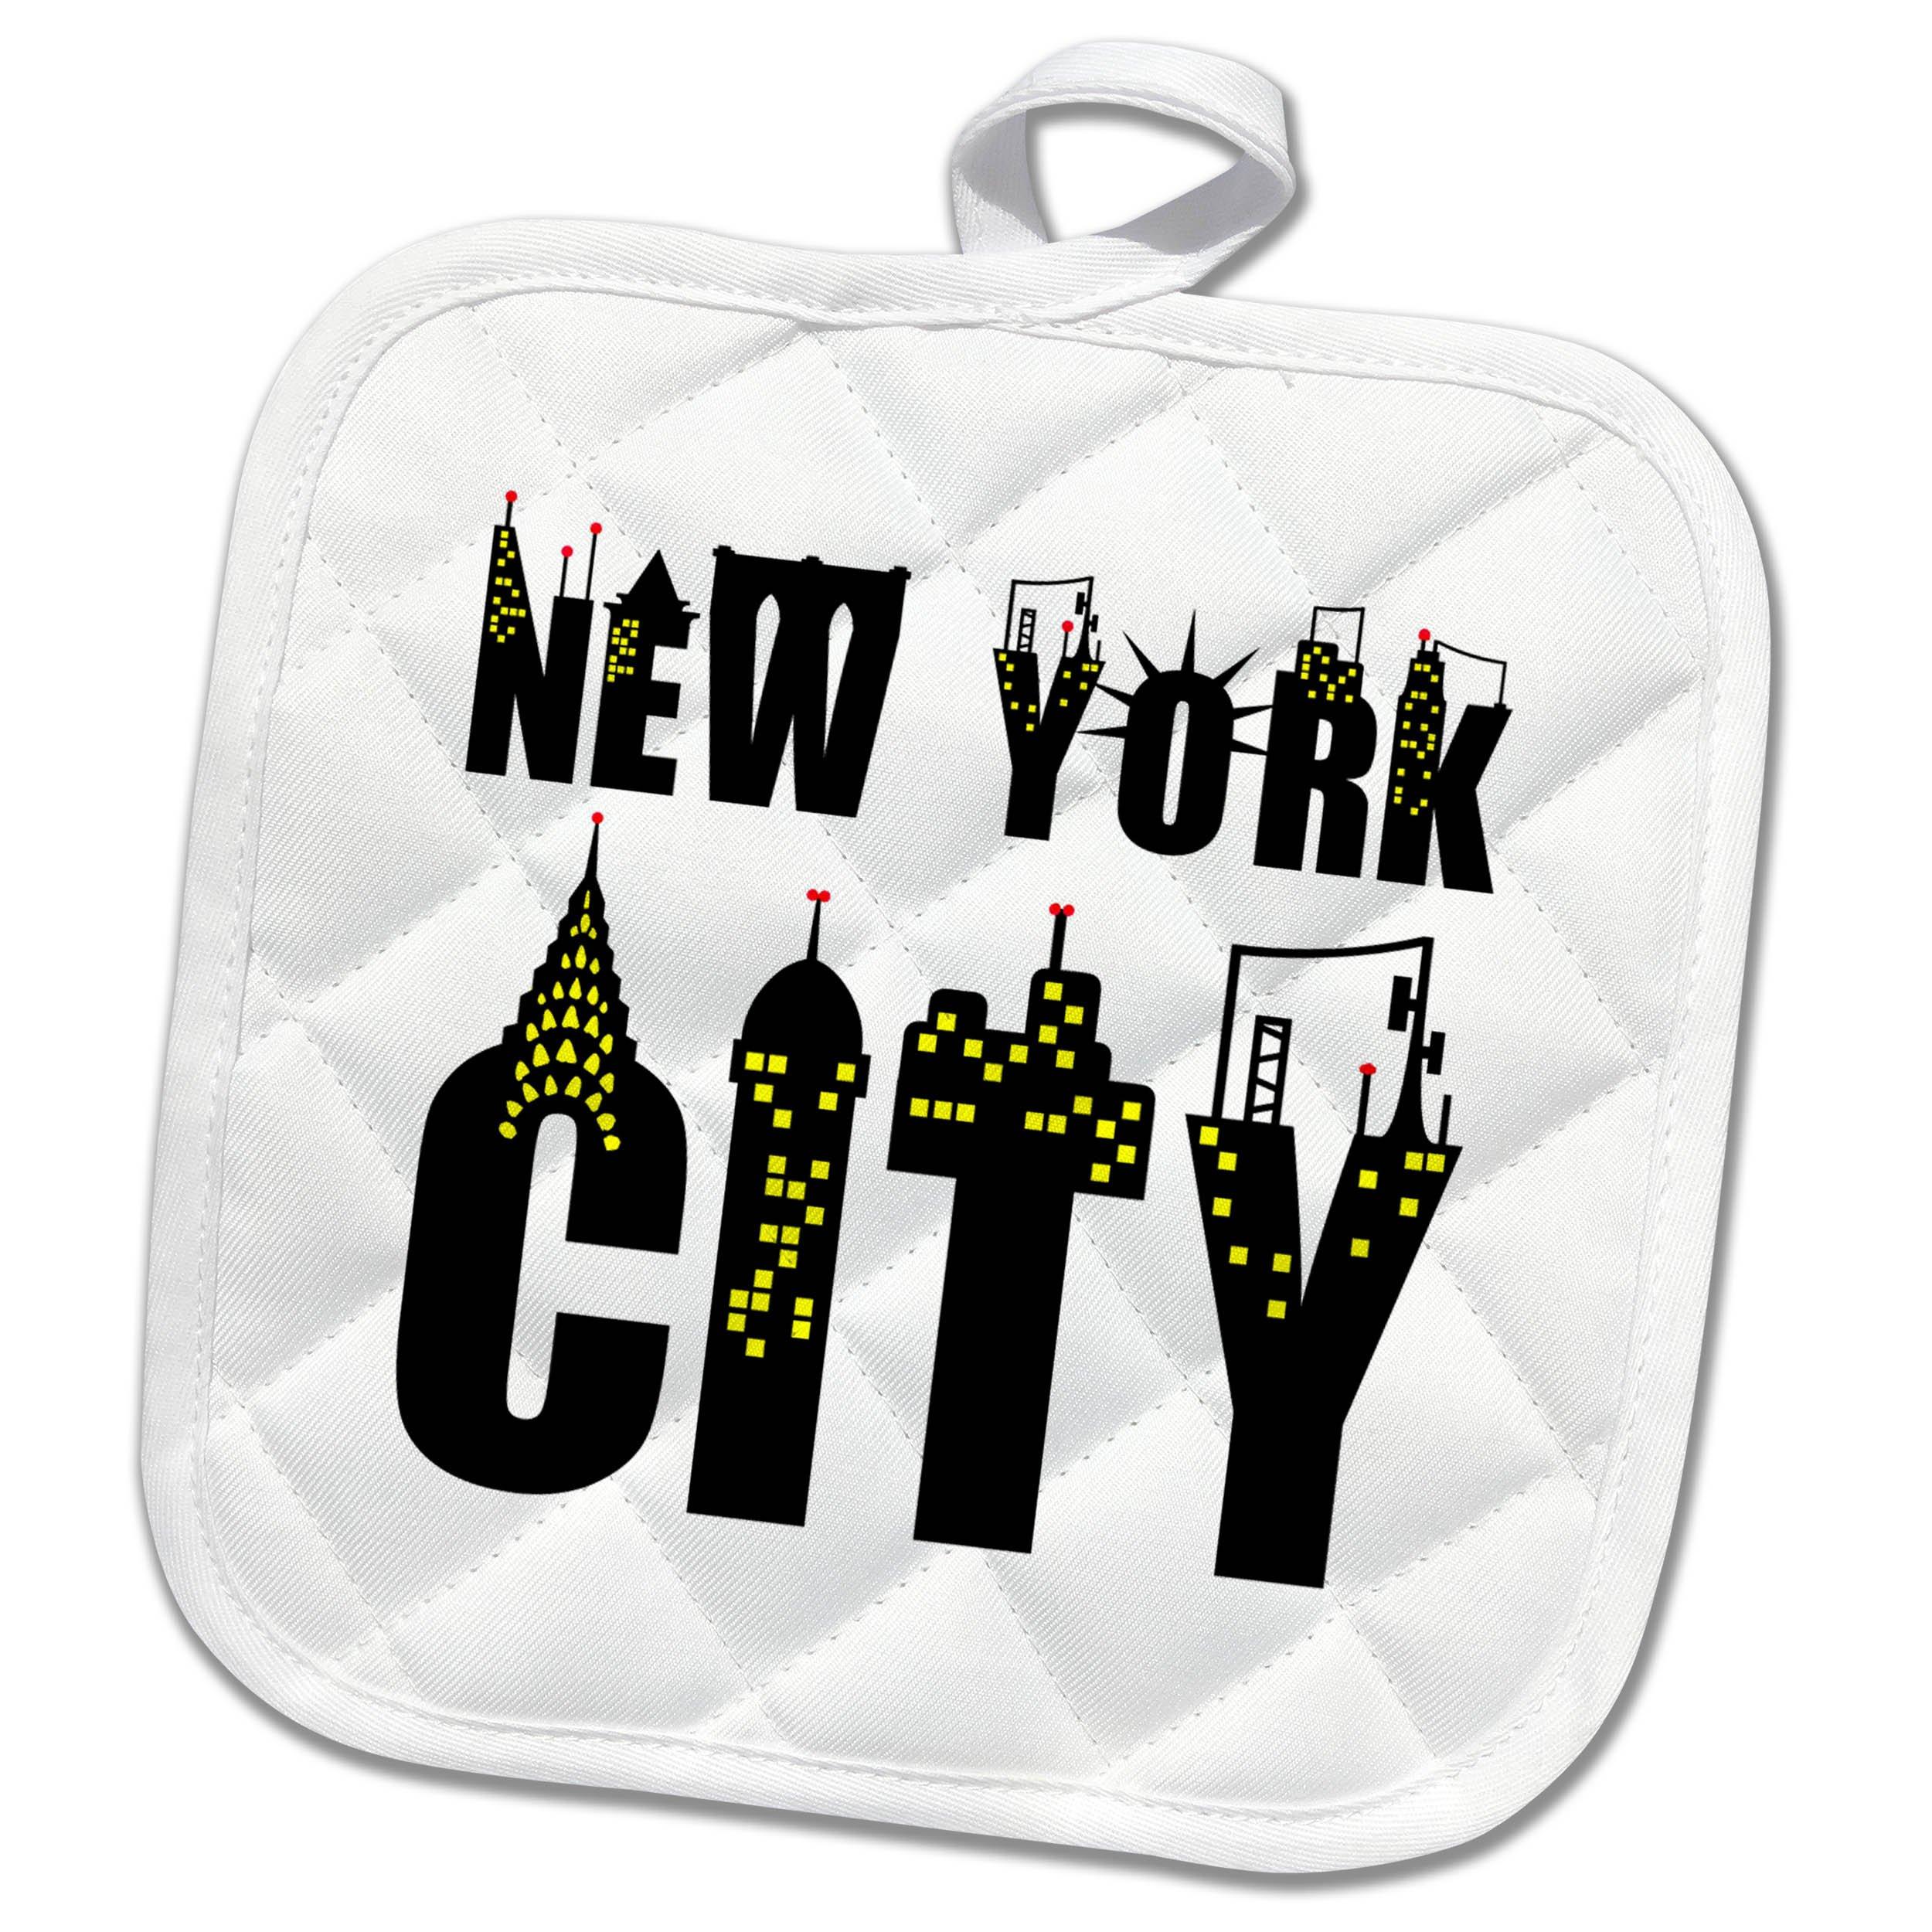 3dRose Alexis Design - American Cities - Decorative text New York City, landmarks, shining windows on white - 8x8 Potholder (phl_286456_1)